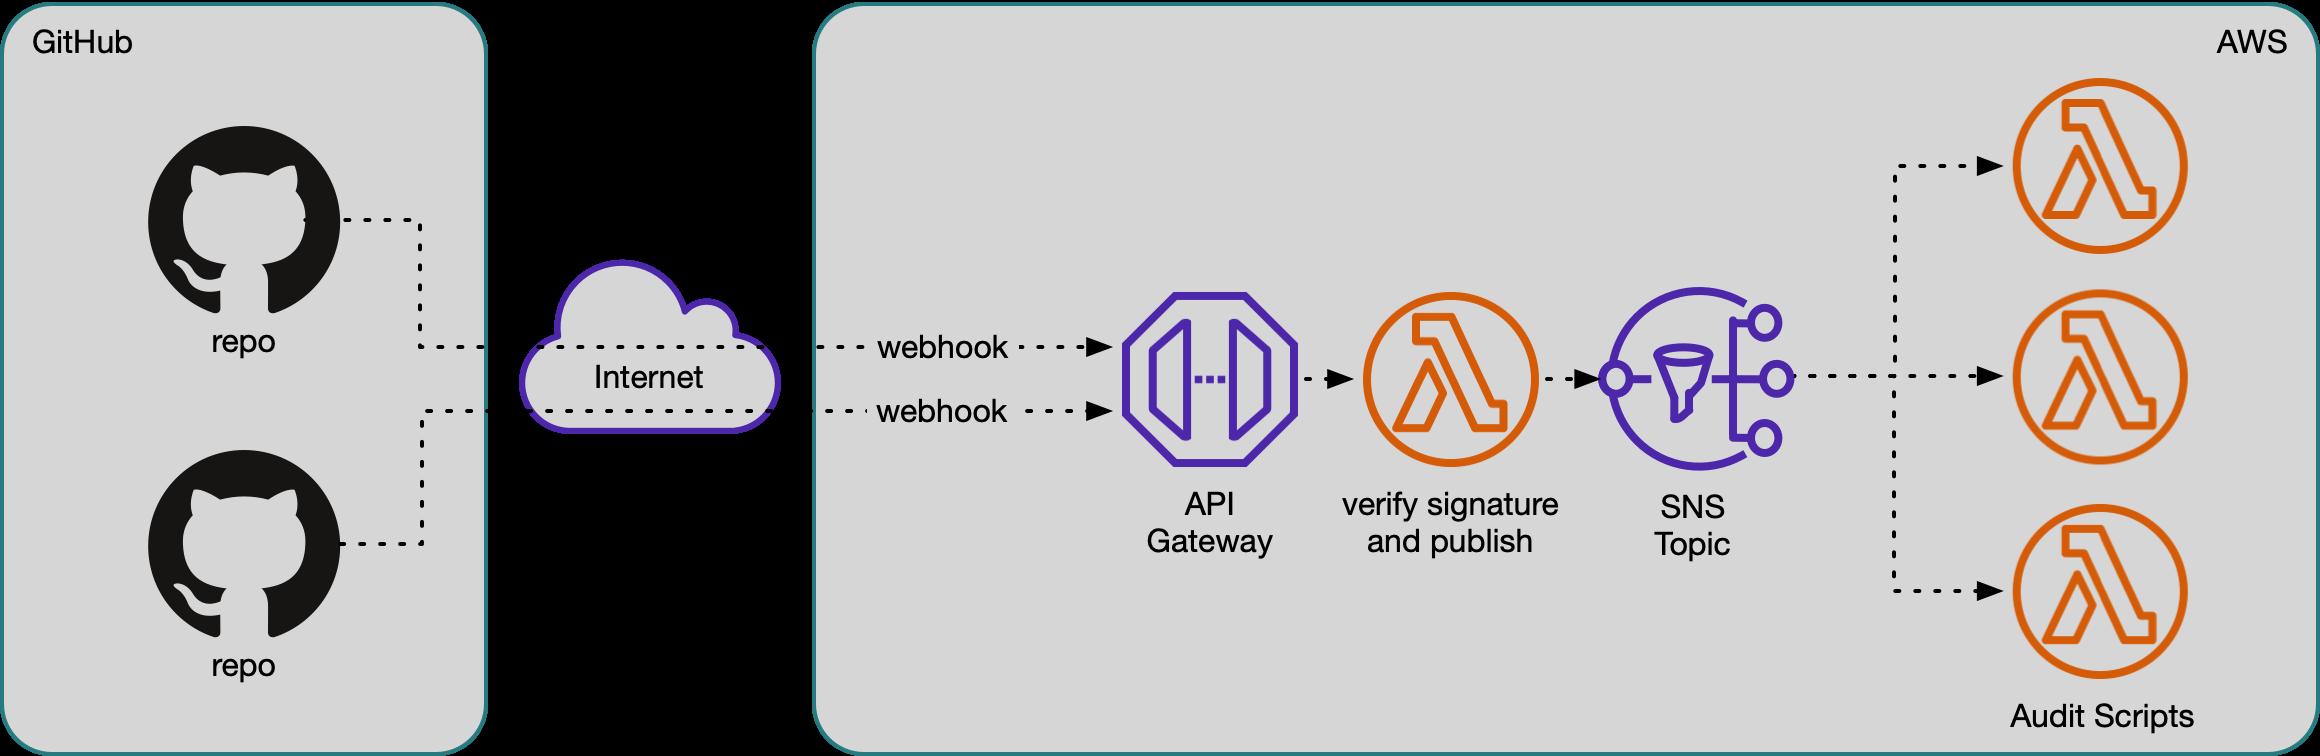 Process flow of a webhook through API Gateway using a lambda integration to publish to SNS